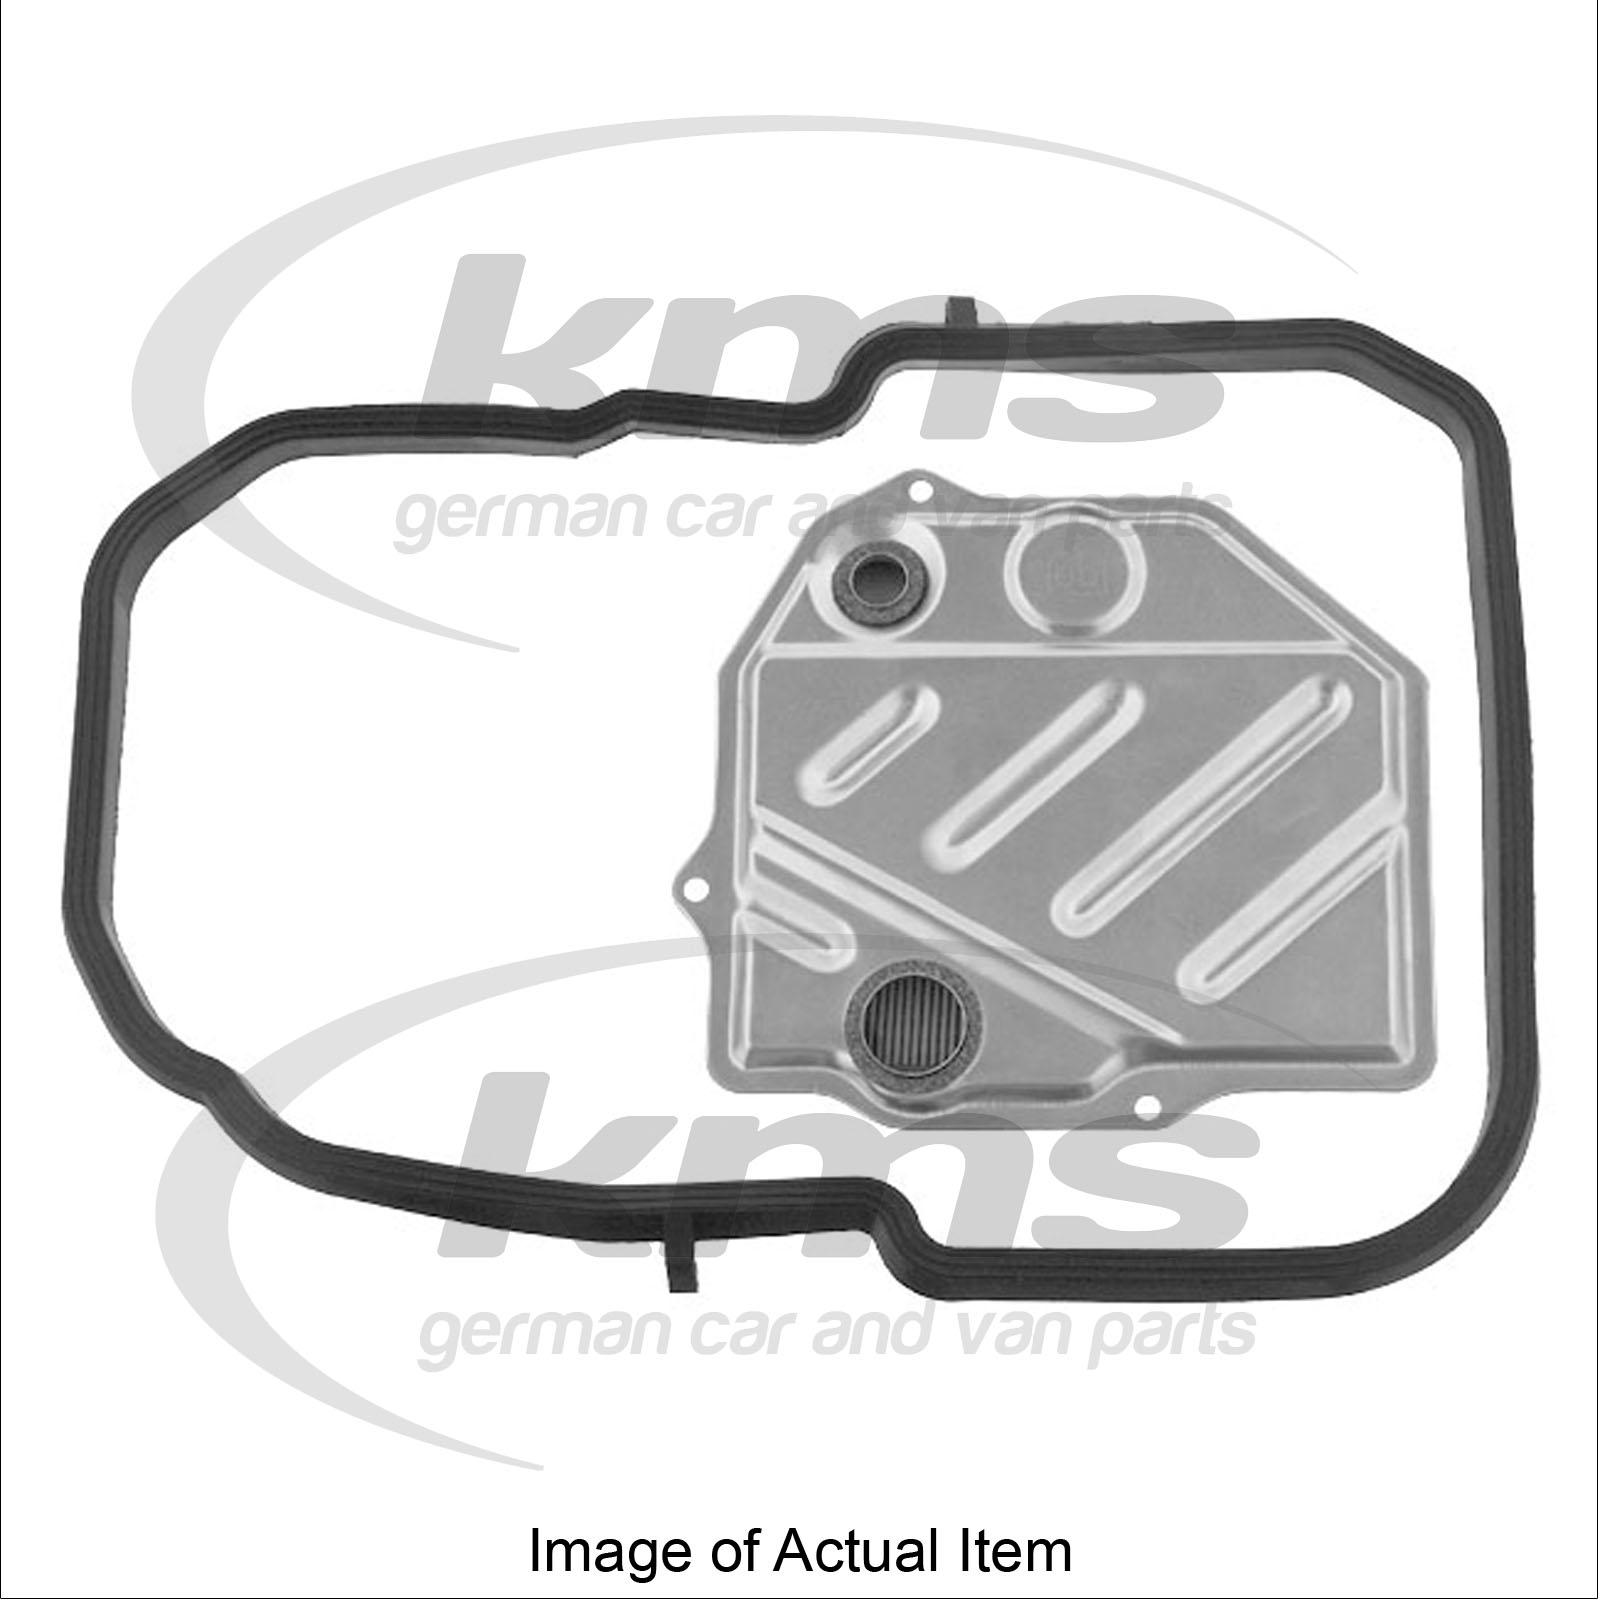 Transmission oil strainer kit mercedes benz sl class for Mercedes benz transmission oil